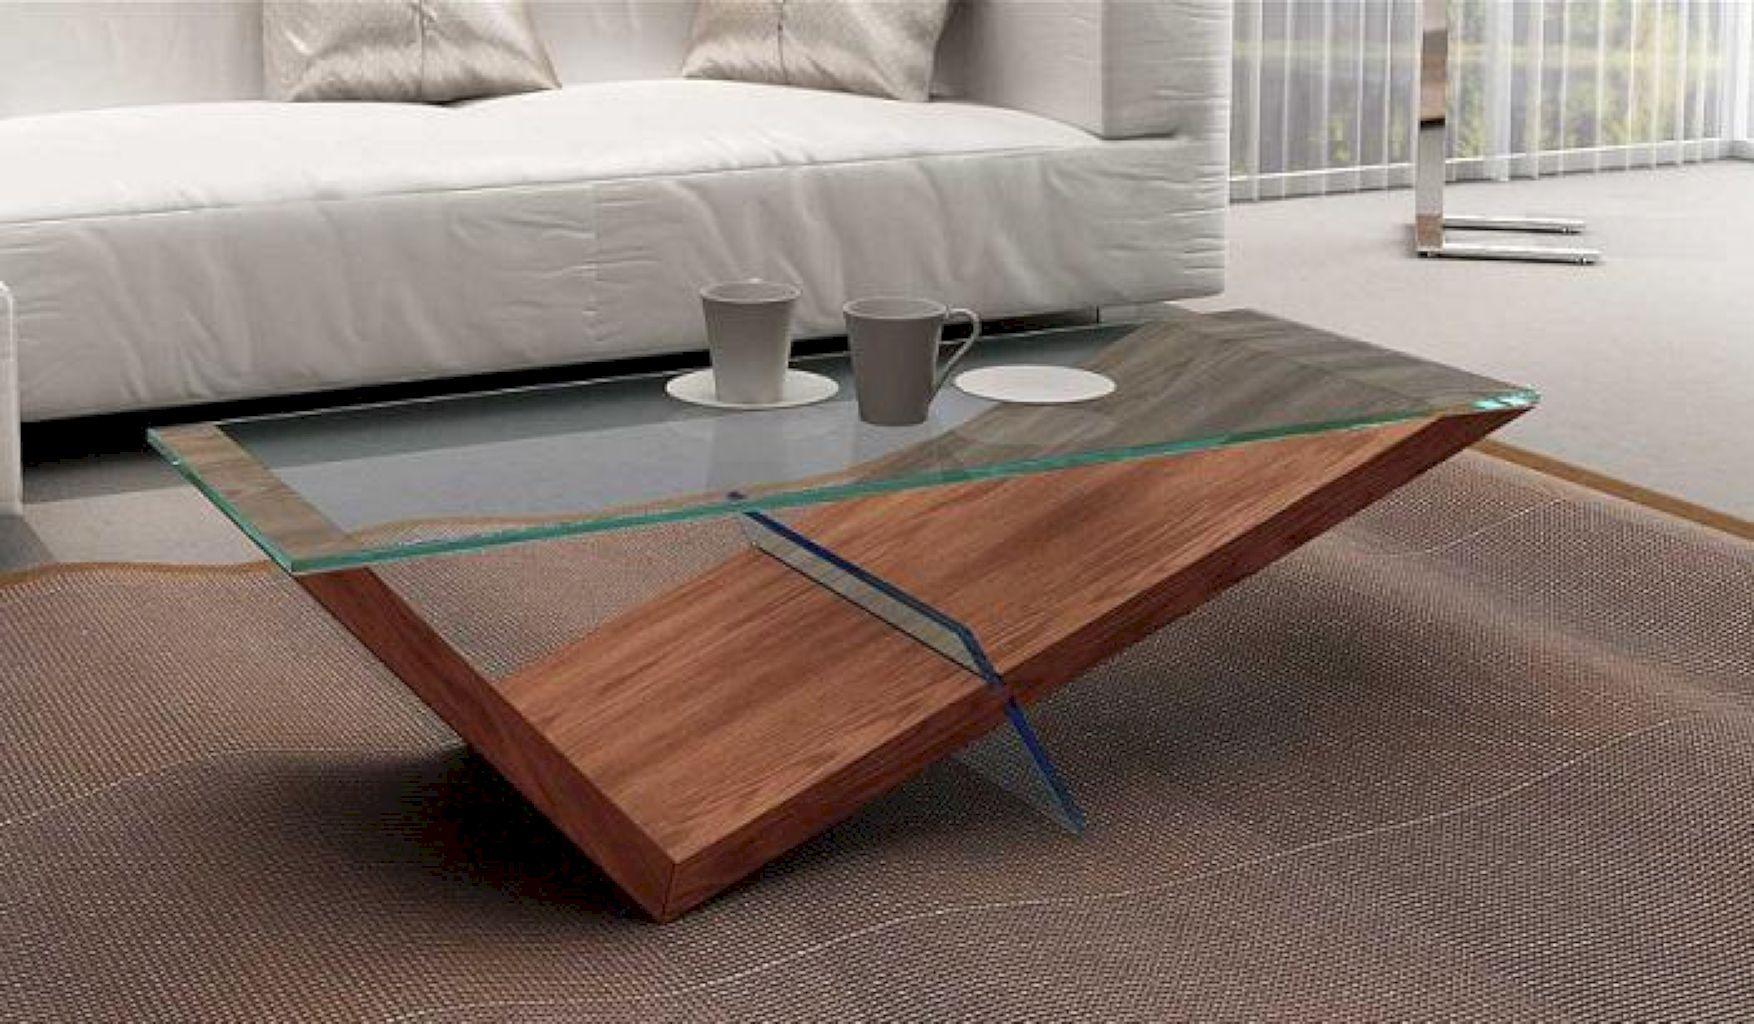 Cool 30 Modern Coffee Tables Design Ideas Https Bellezaroom Com 2017 09 25 30 Modern Coffee Tables Desig Coffee Table Design Modern Coffee Table Table Design [ 1024 x 1754 Pixel ]